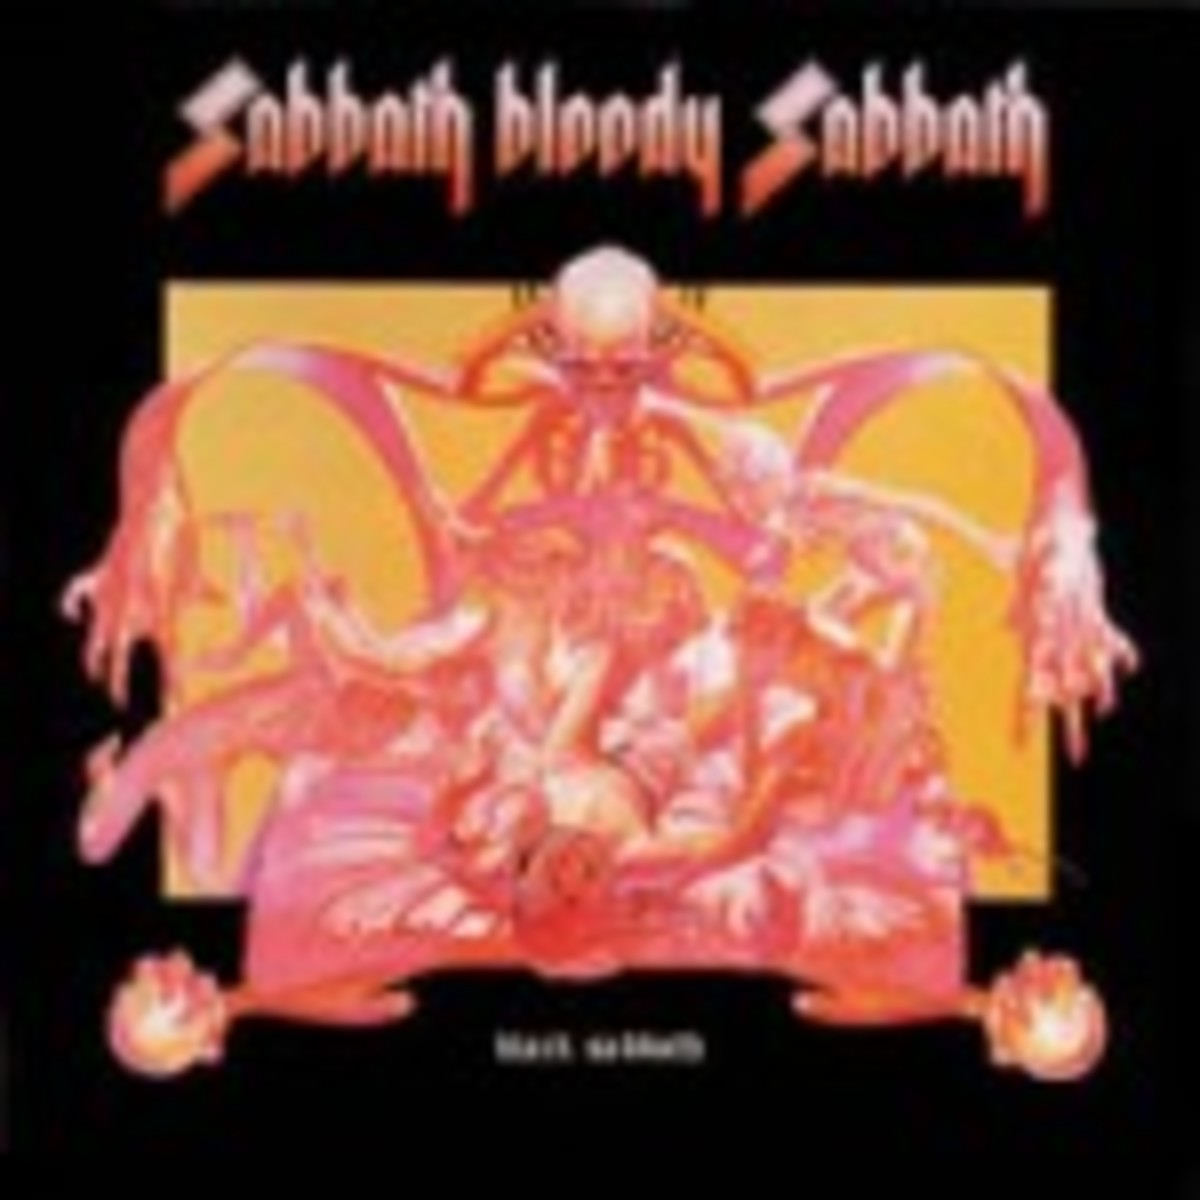 BlackSabbath_SabbathBloodySabbath